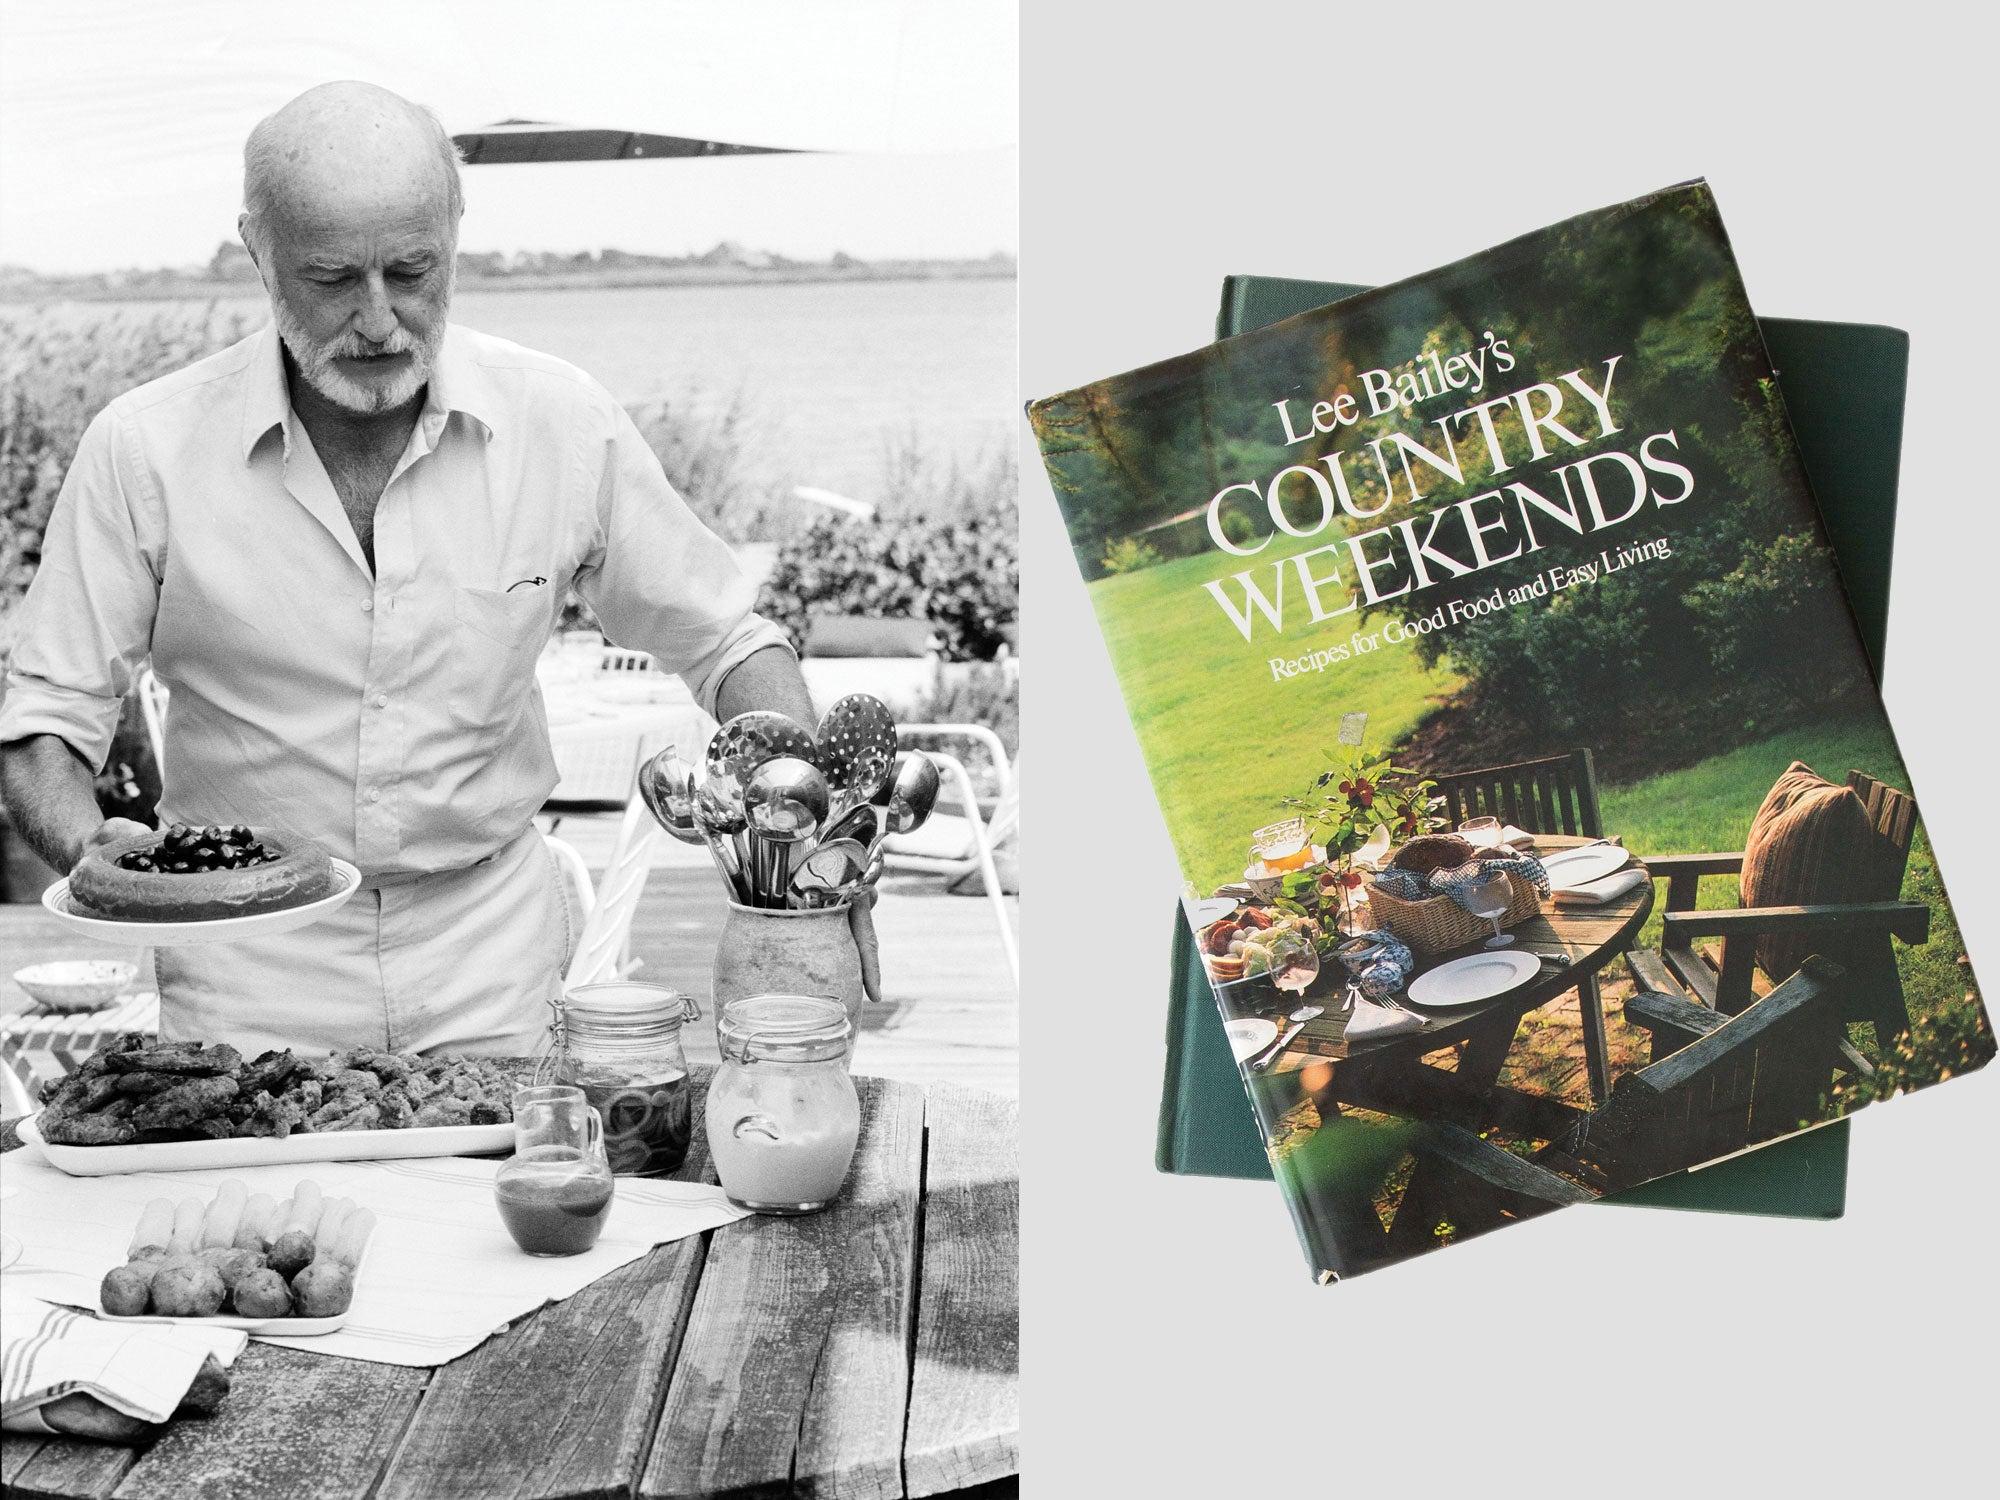 Lee Bailey; Country Weekends